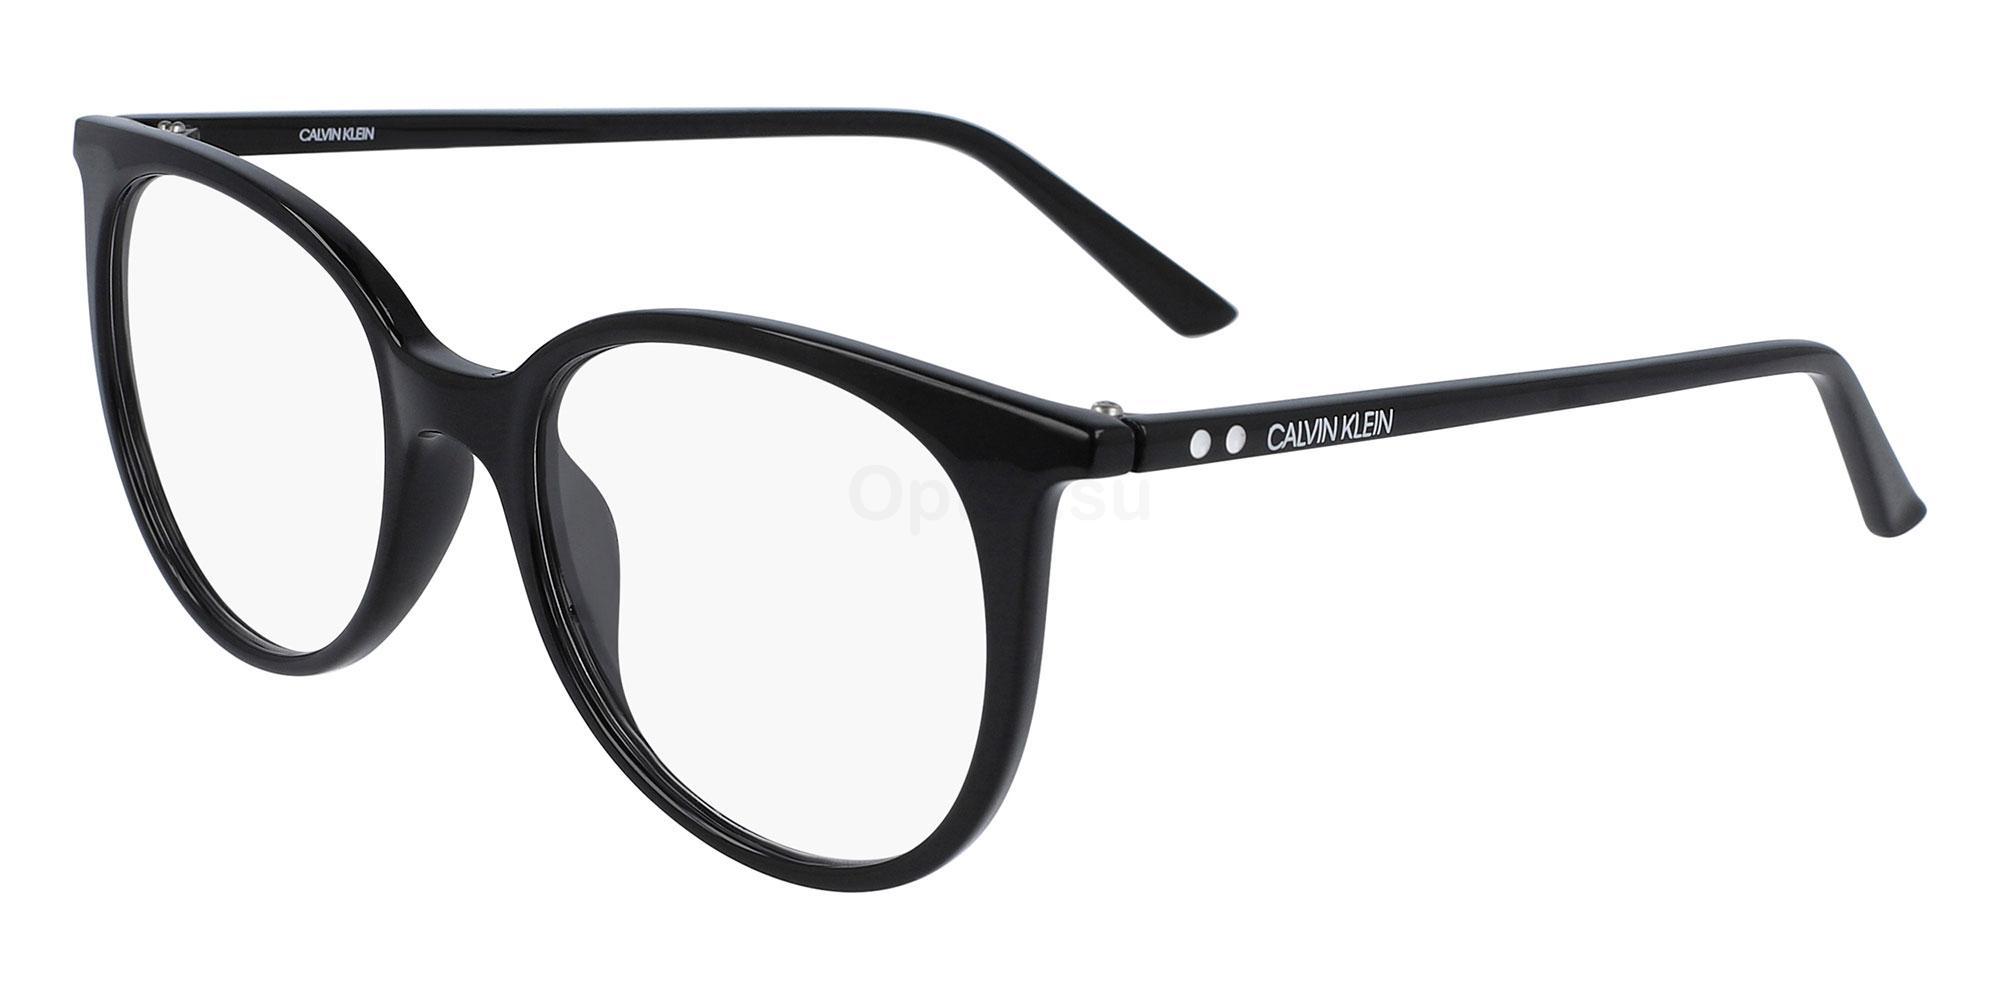 001 CK19508 Glasses, Calvin Klein